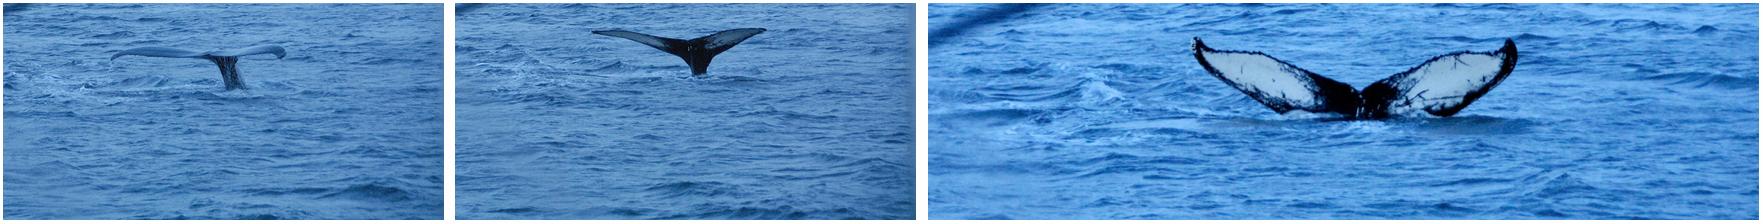 #Whalewatching #Whalesafari #Tromsø